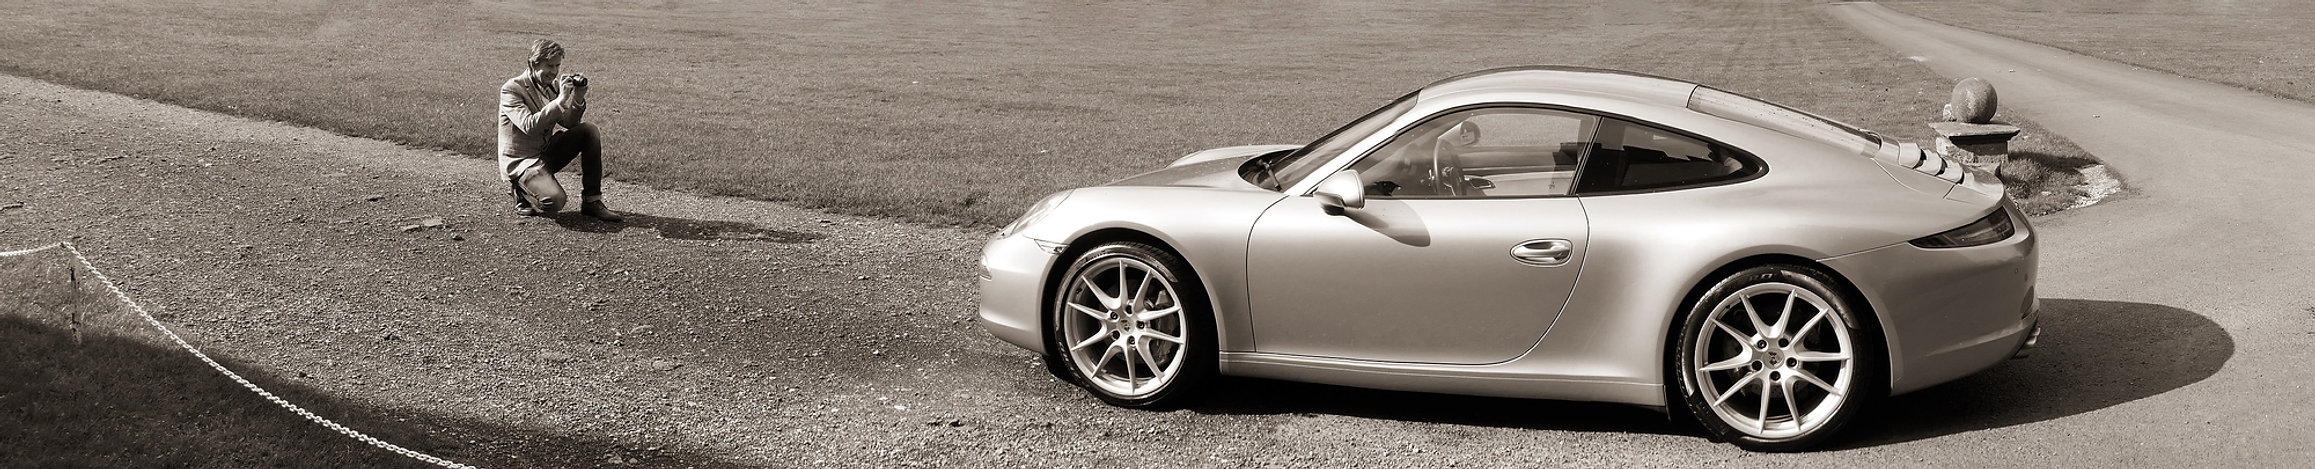 car 002 STRIP.jpg